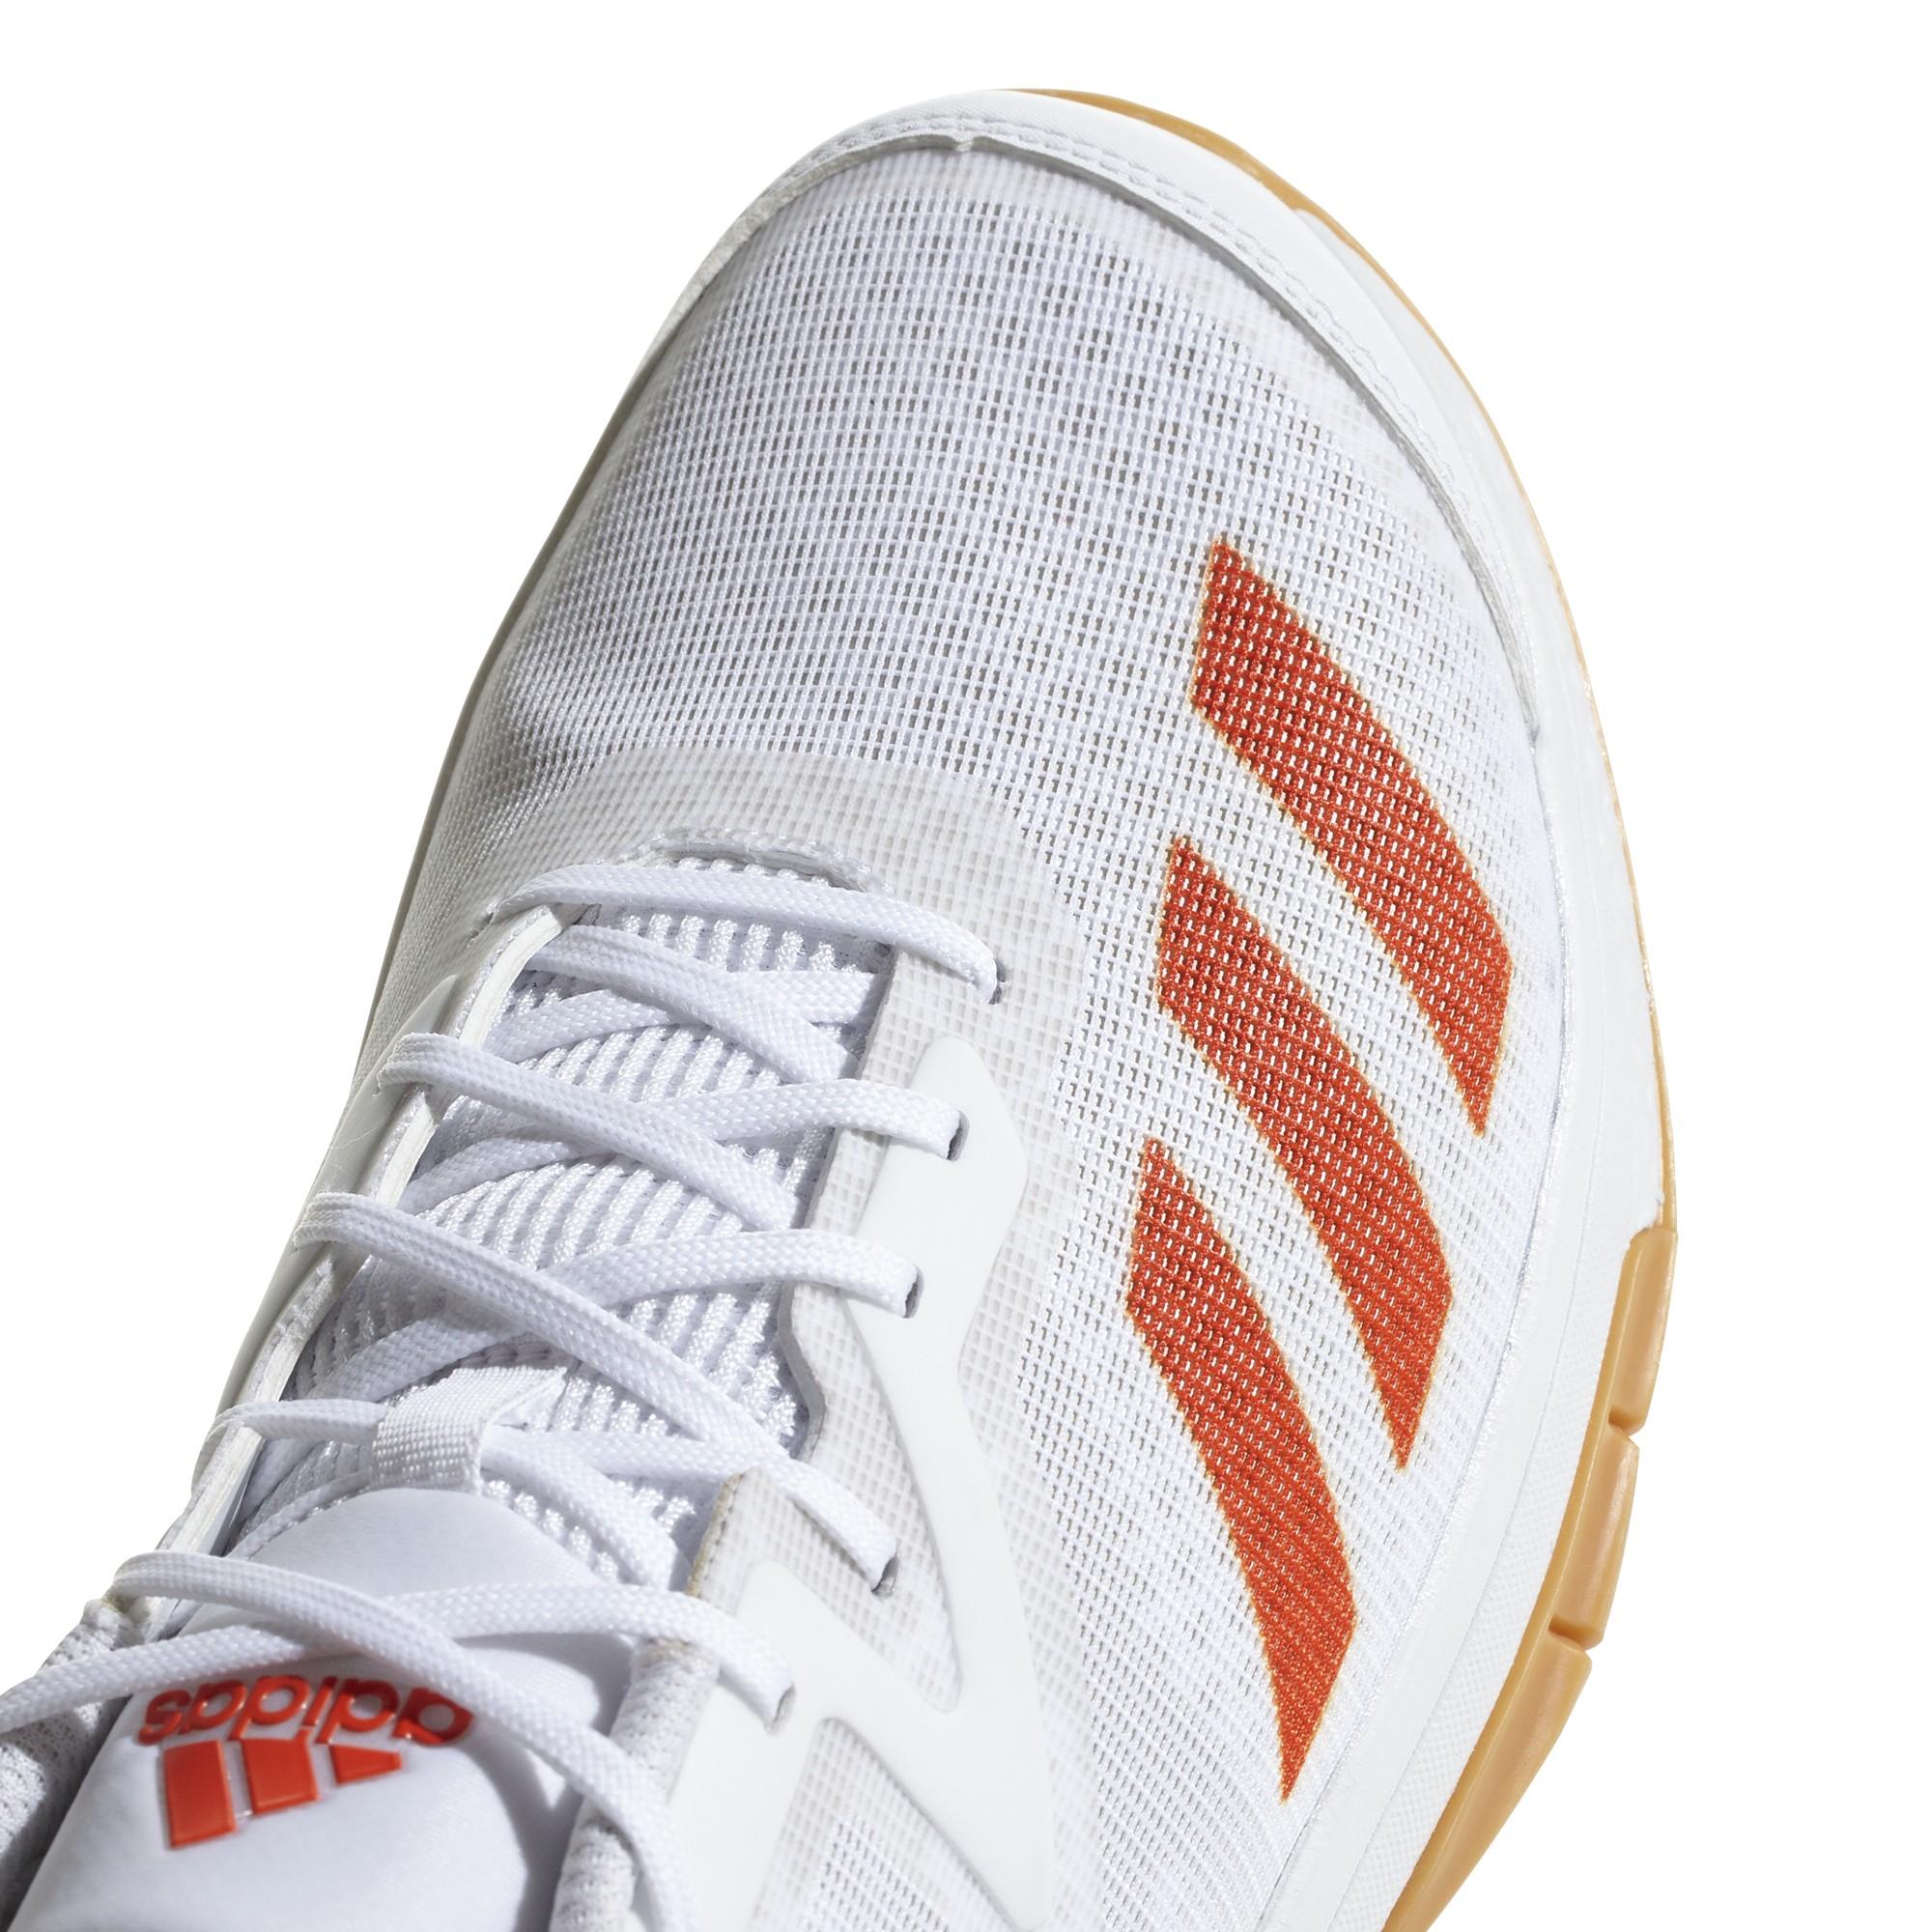 Adidas Integral Exadic Counterblast Sport Handball Chaussures 6qBwH5Px